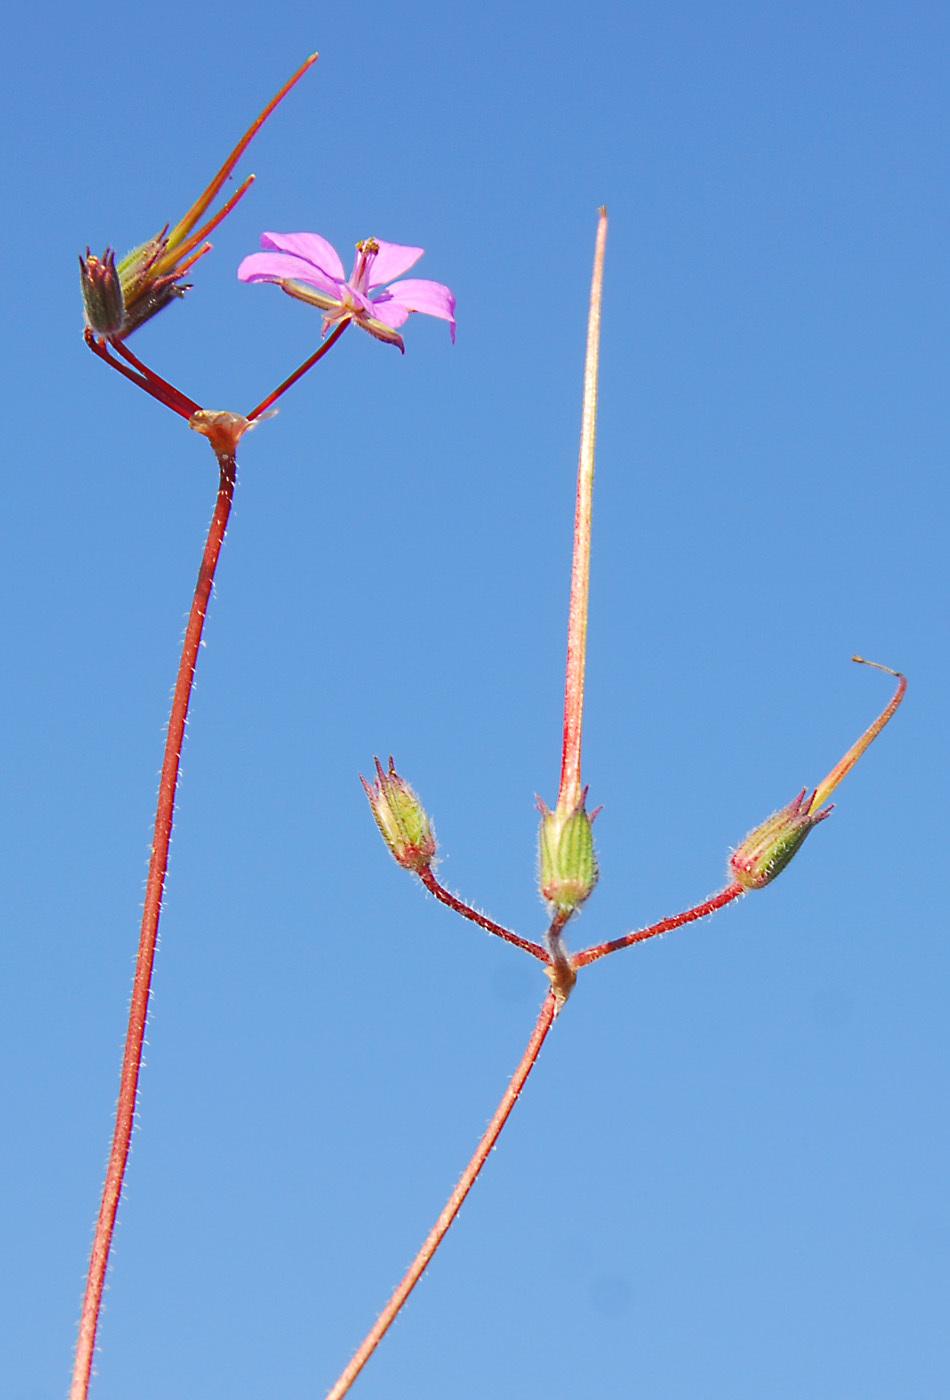 https://pictures.bgbm.org/digilib/Scaler?fn=Cyprus/Erodium_laciniatum_B1.jpg&mo=file